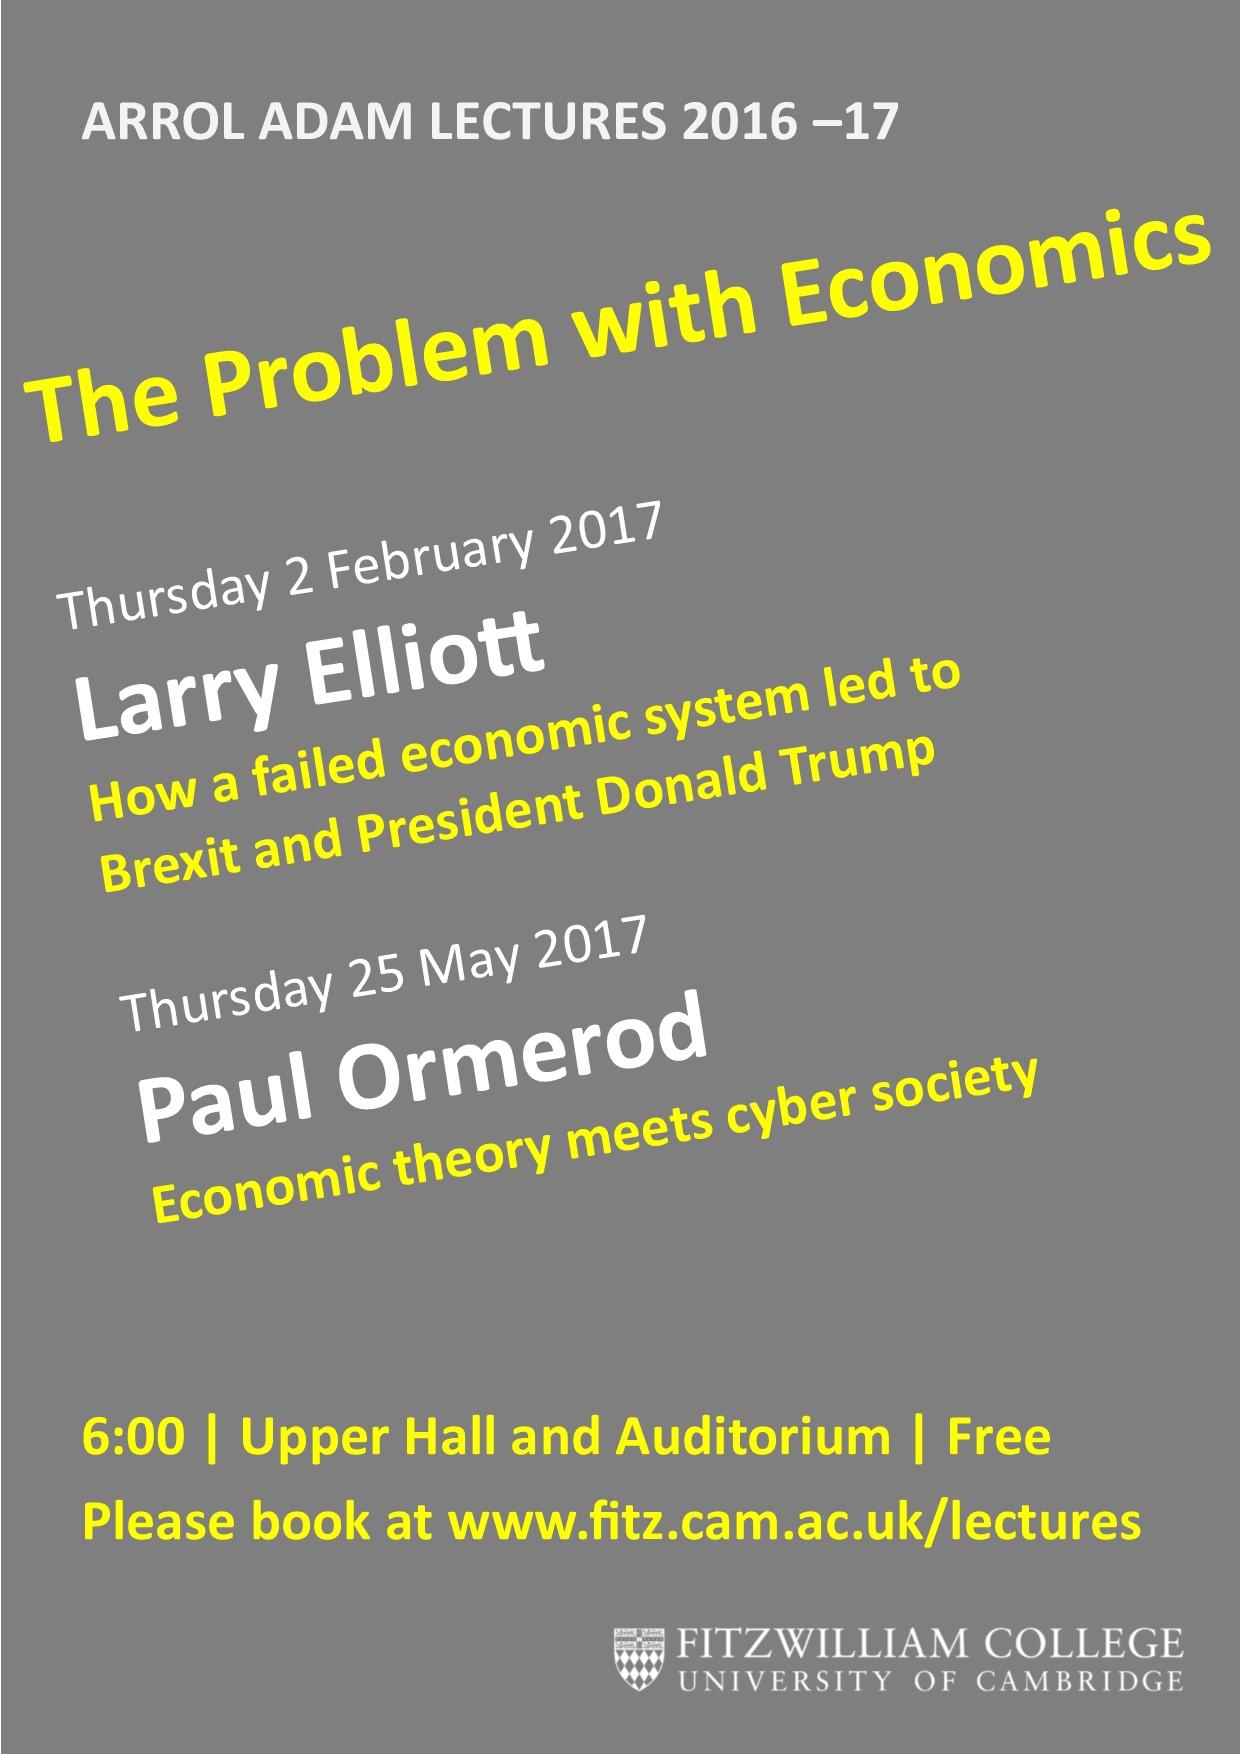 Arrol Adam Lectures 2017